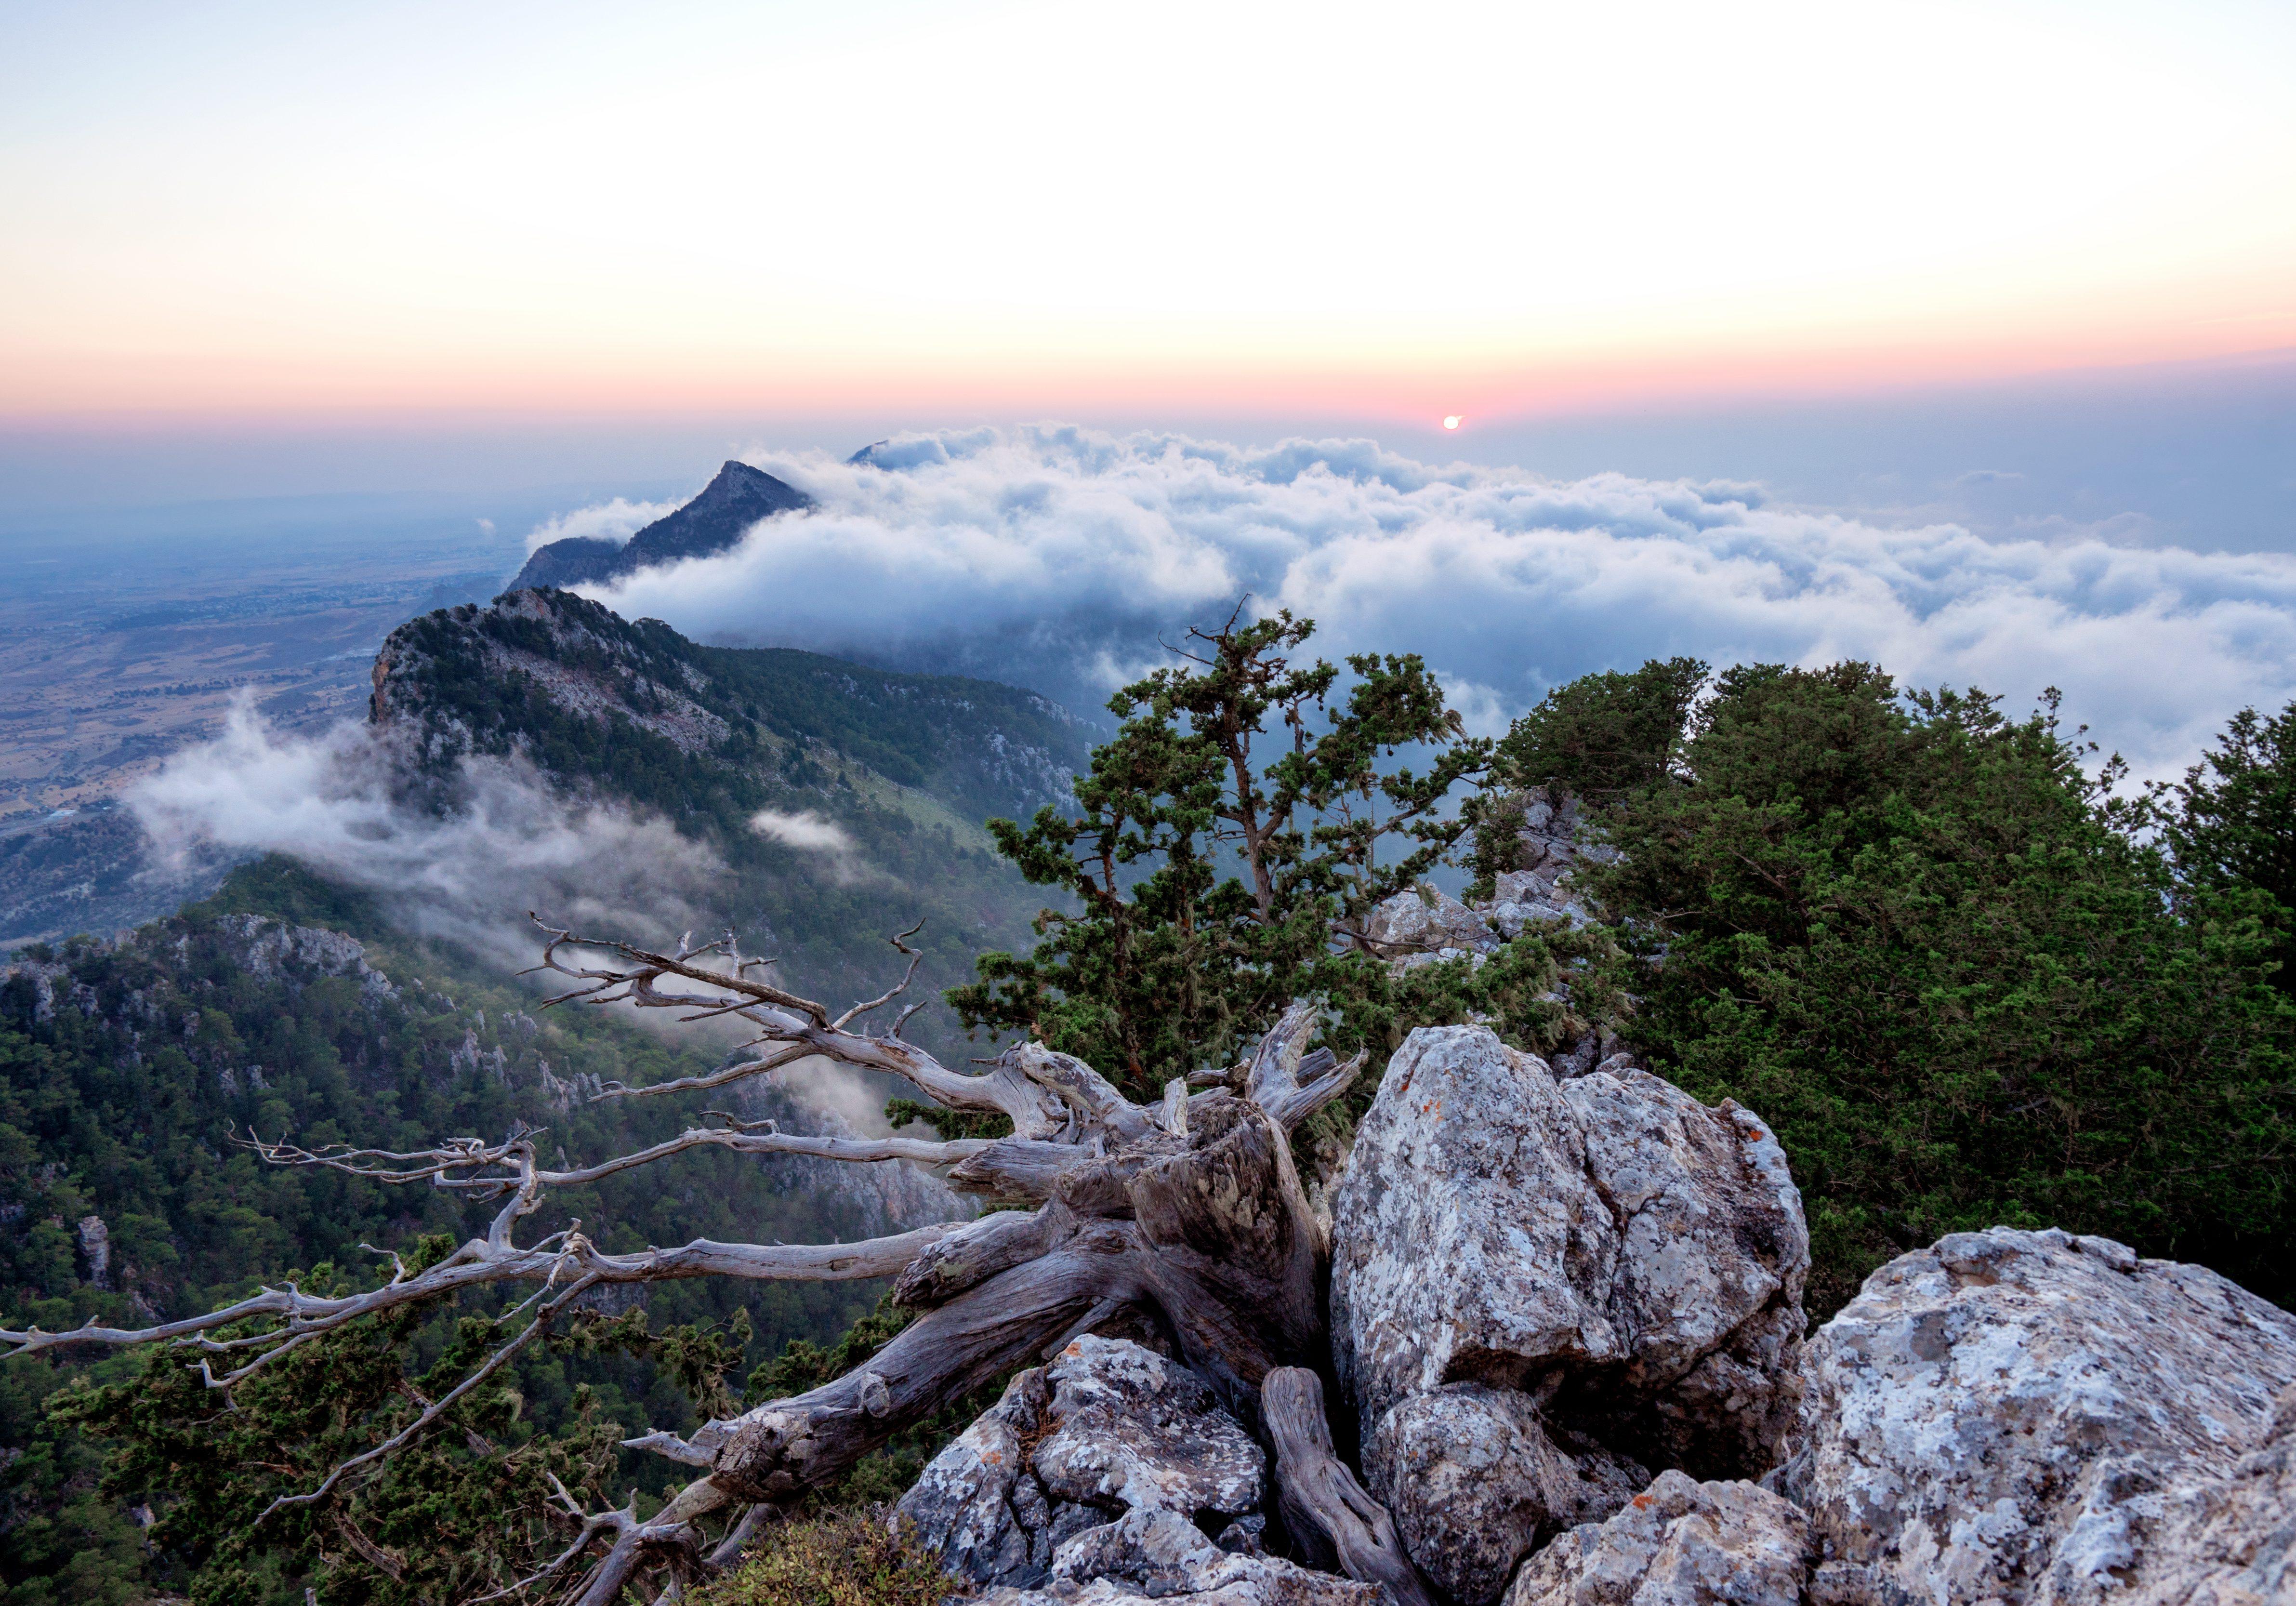 Sunset on the top of Kirenya Mountains, Northen Cyprus